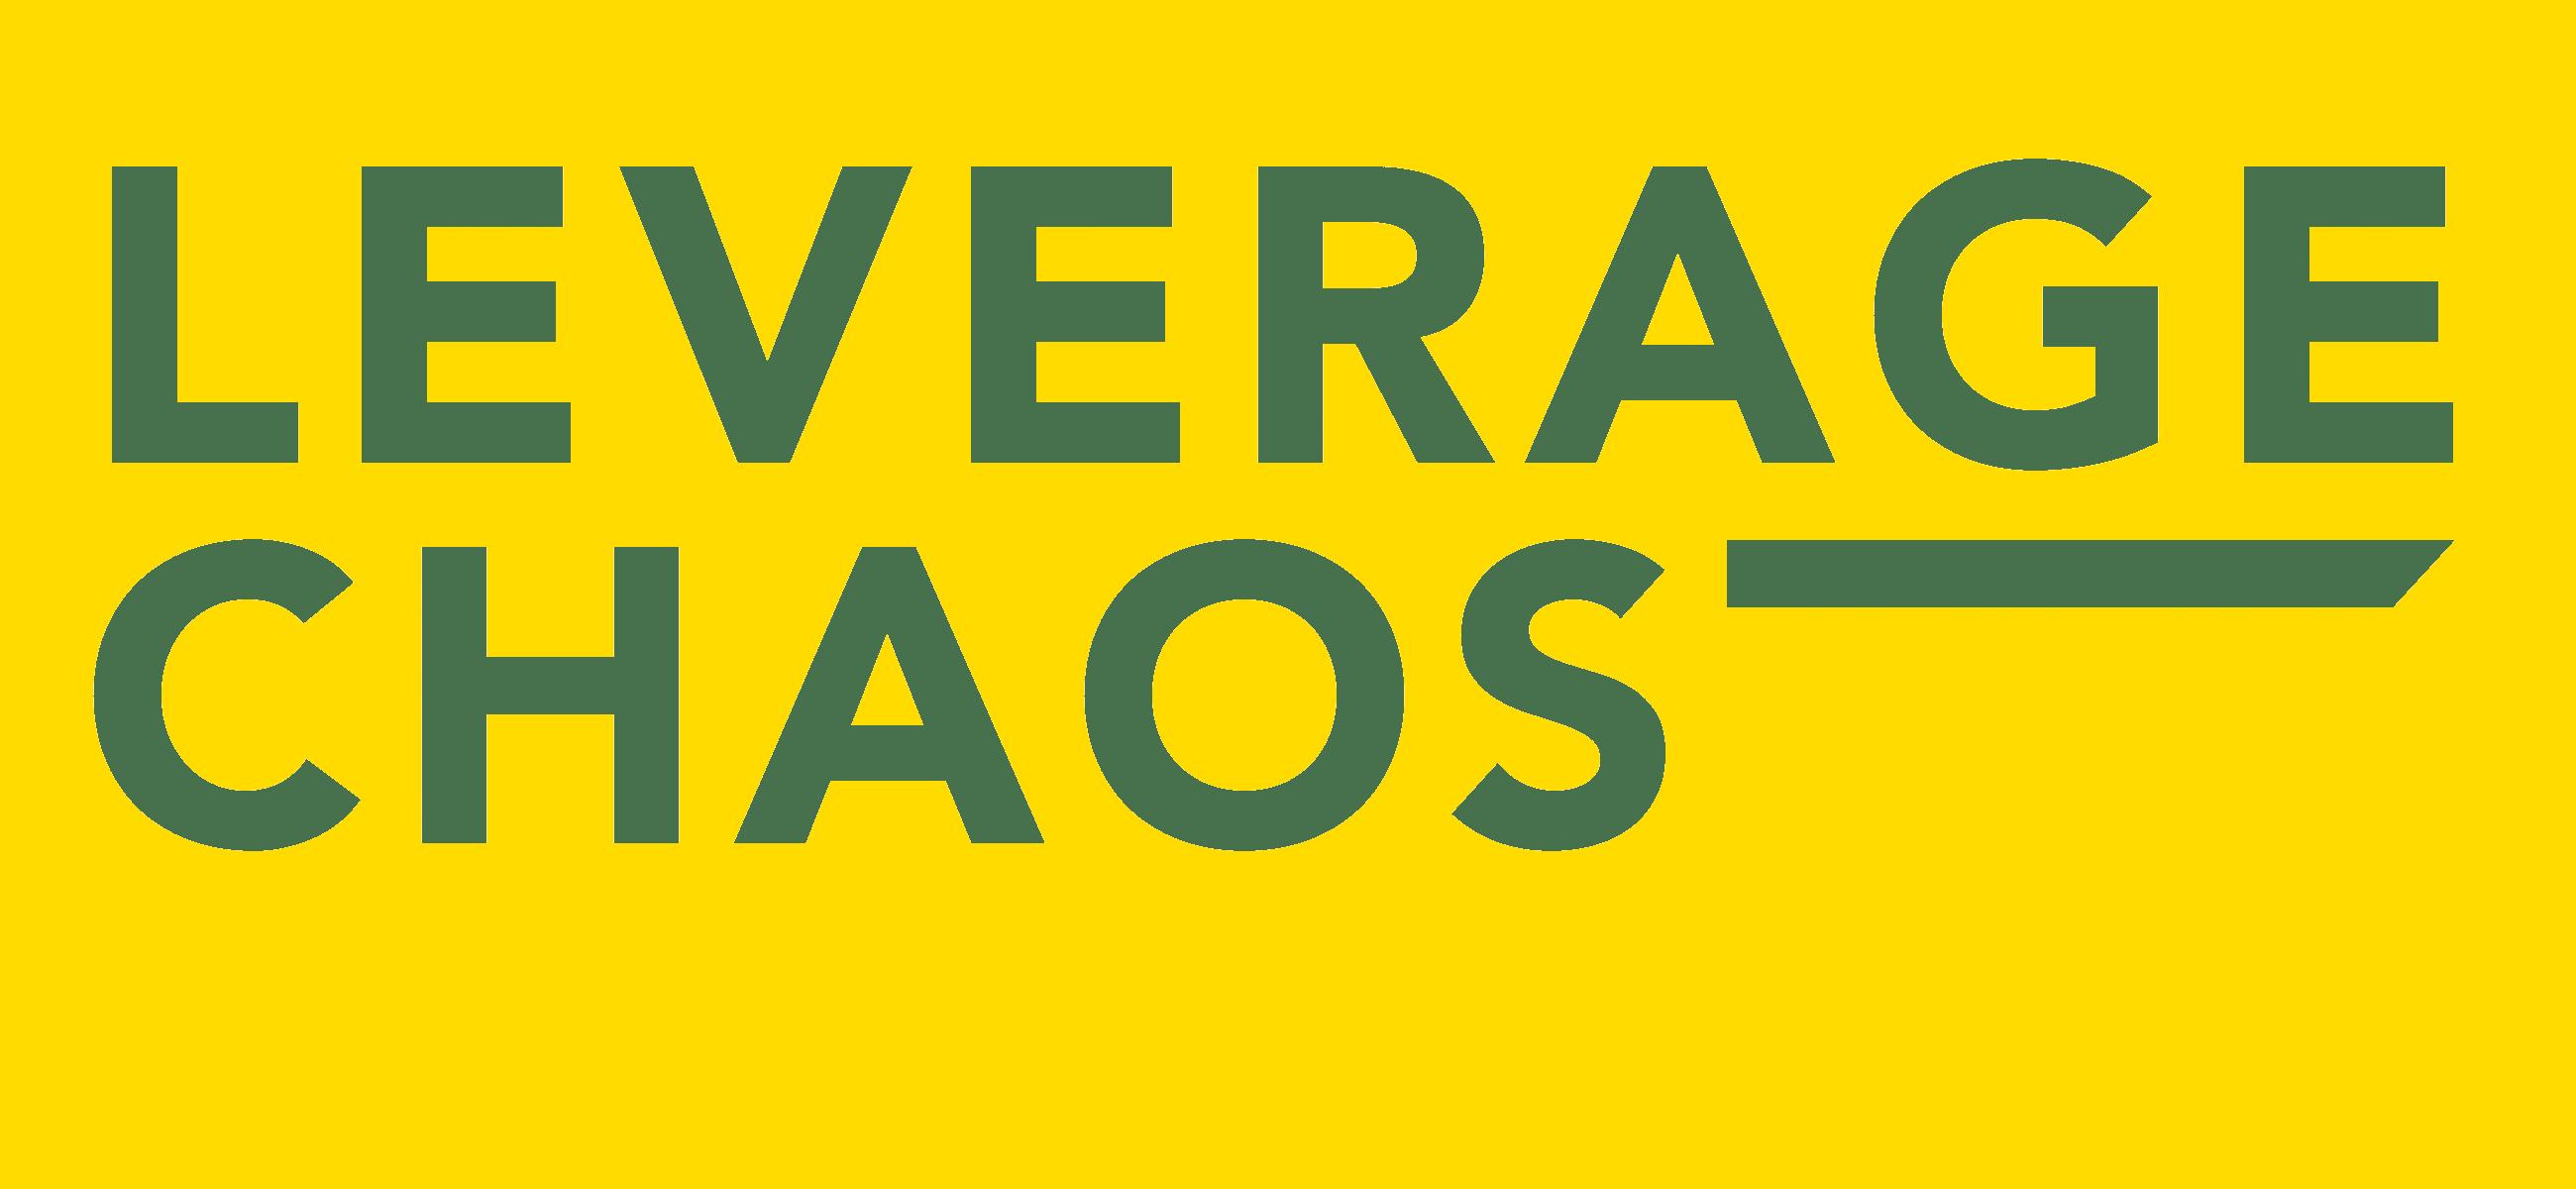 leveragechaos